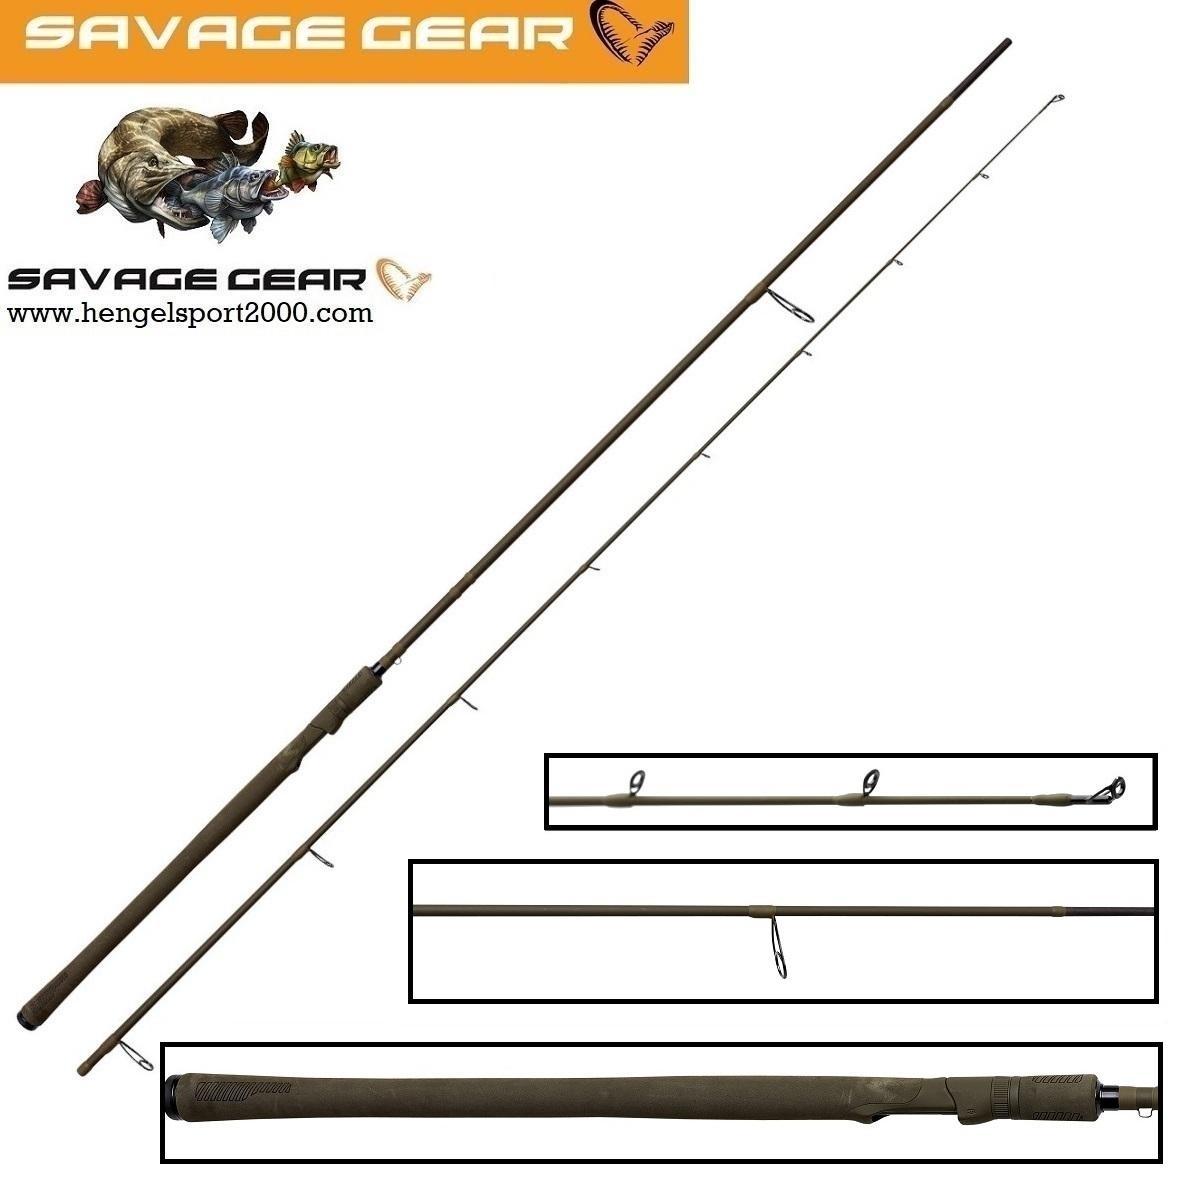 Savage Gear SG4 Short Game 274 cm 7 - 23 gram